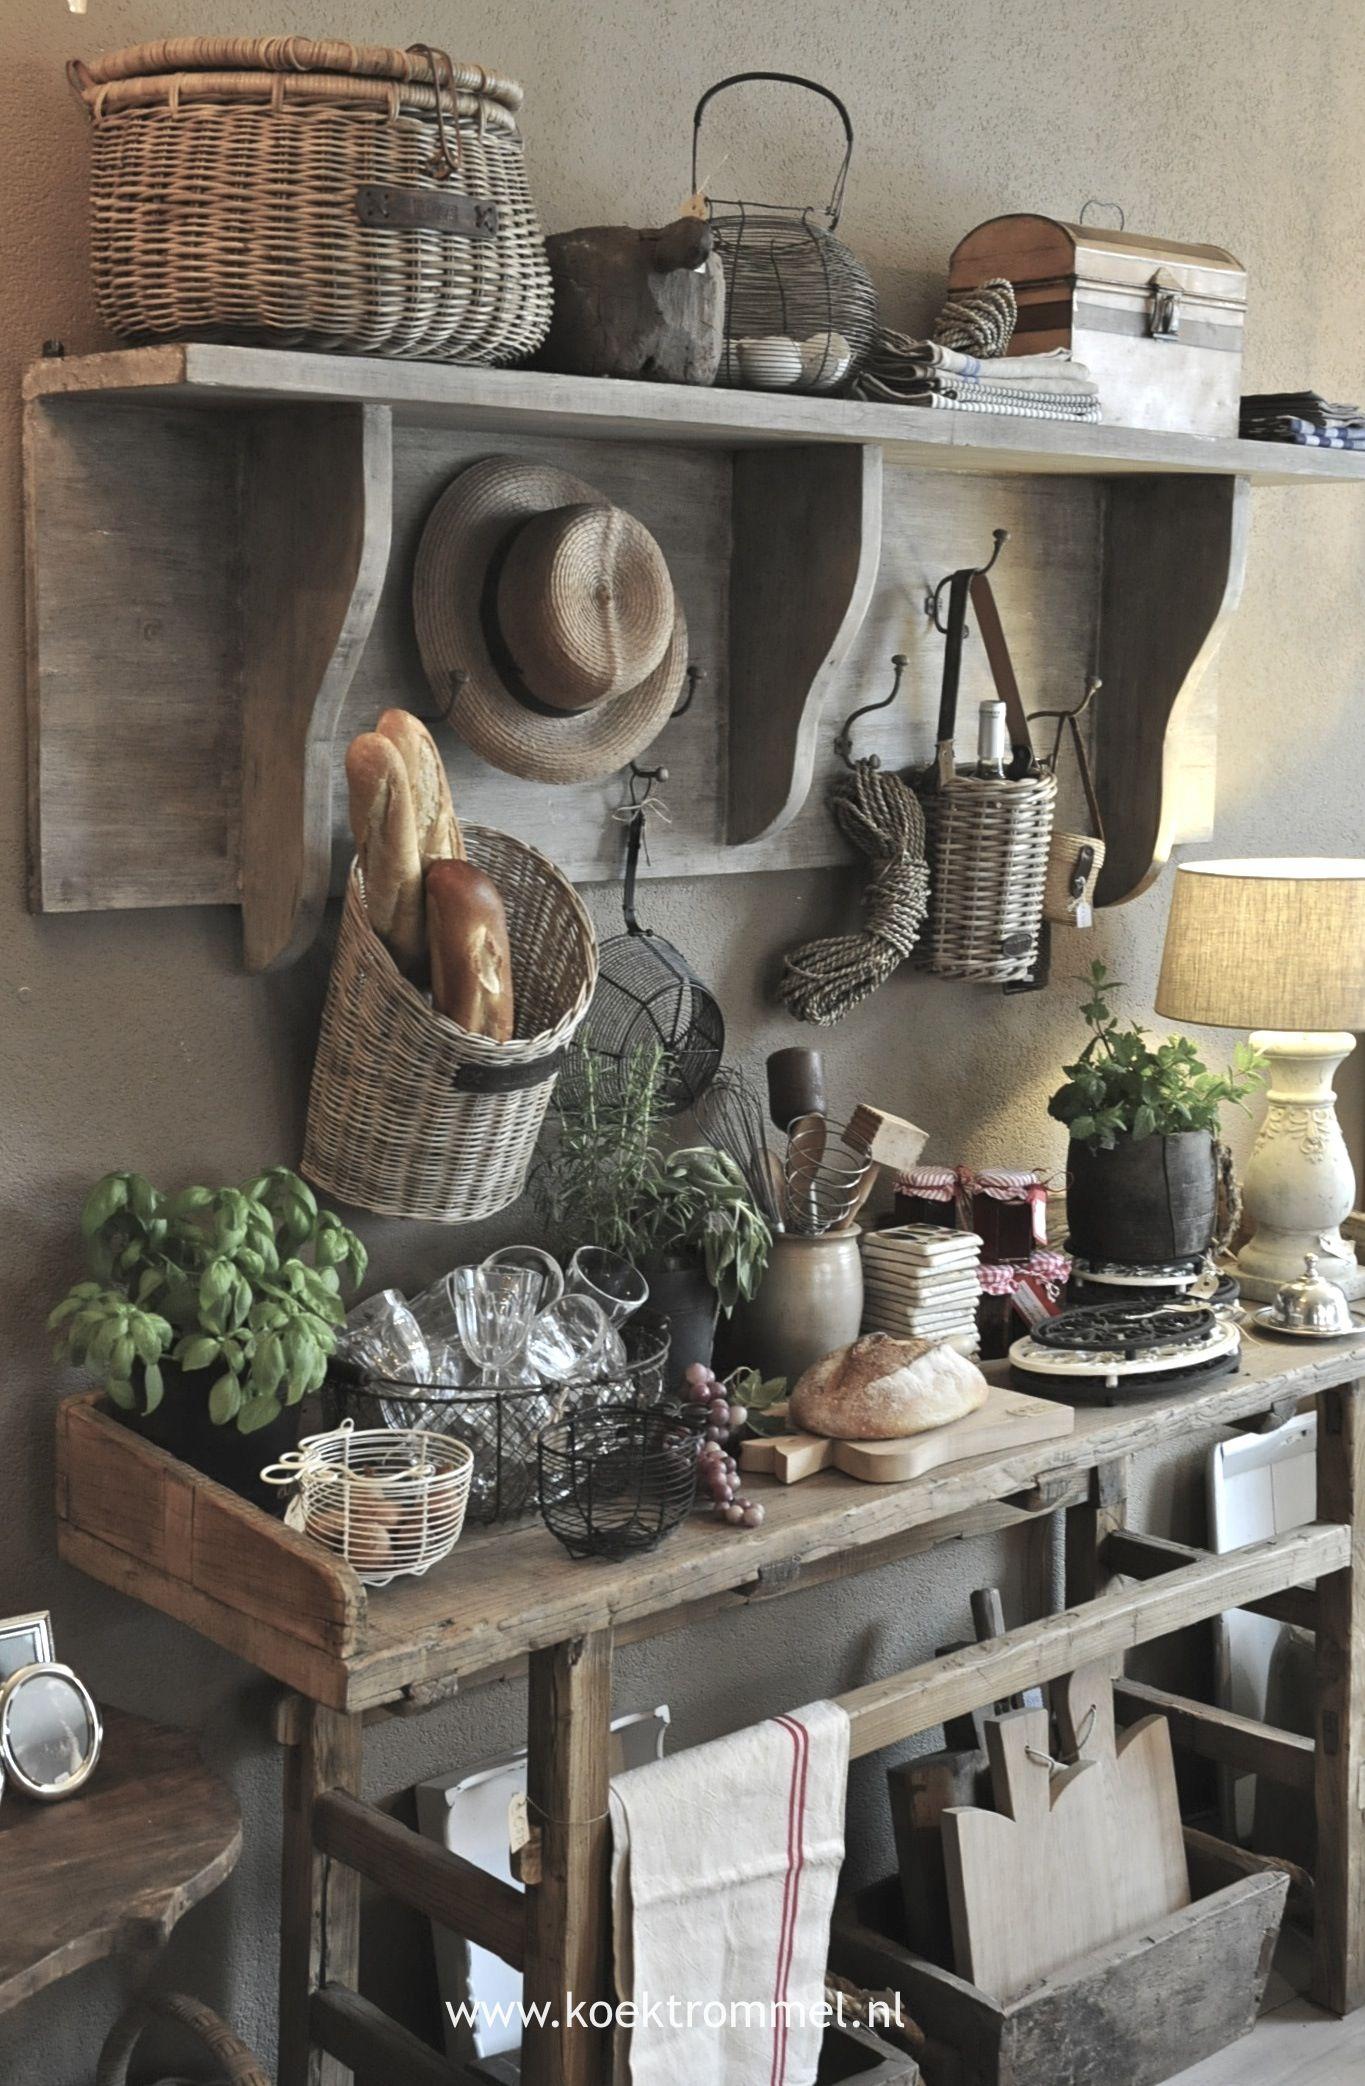 8 Beautiful Rustic Country Farmhouse Decor Ideas Chalet Keukens Rustiek Boerderij Decor Boerenkeuken Decor